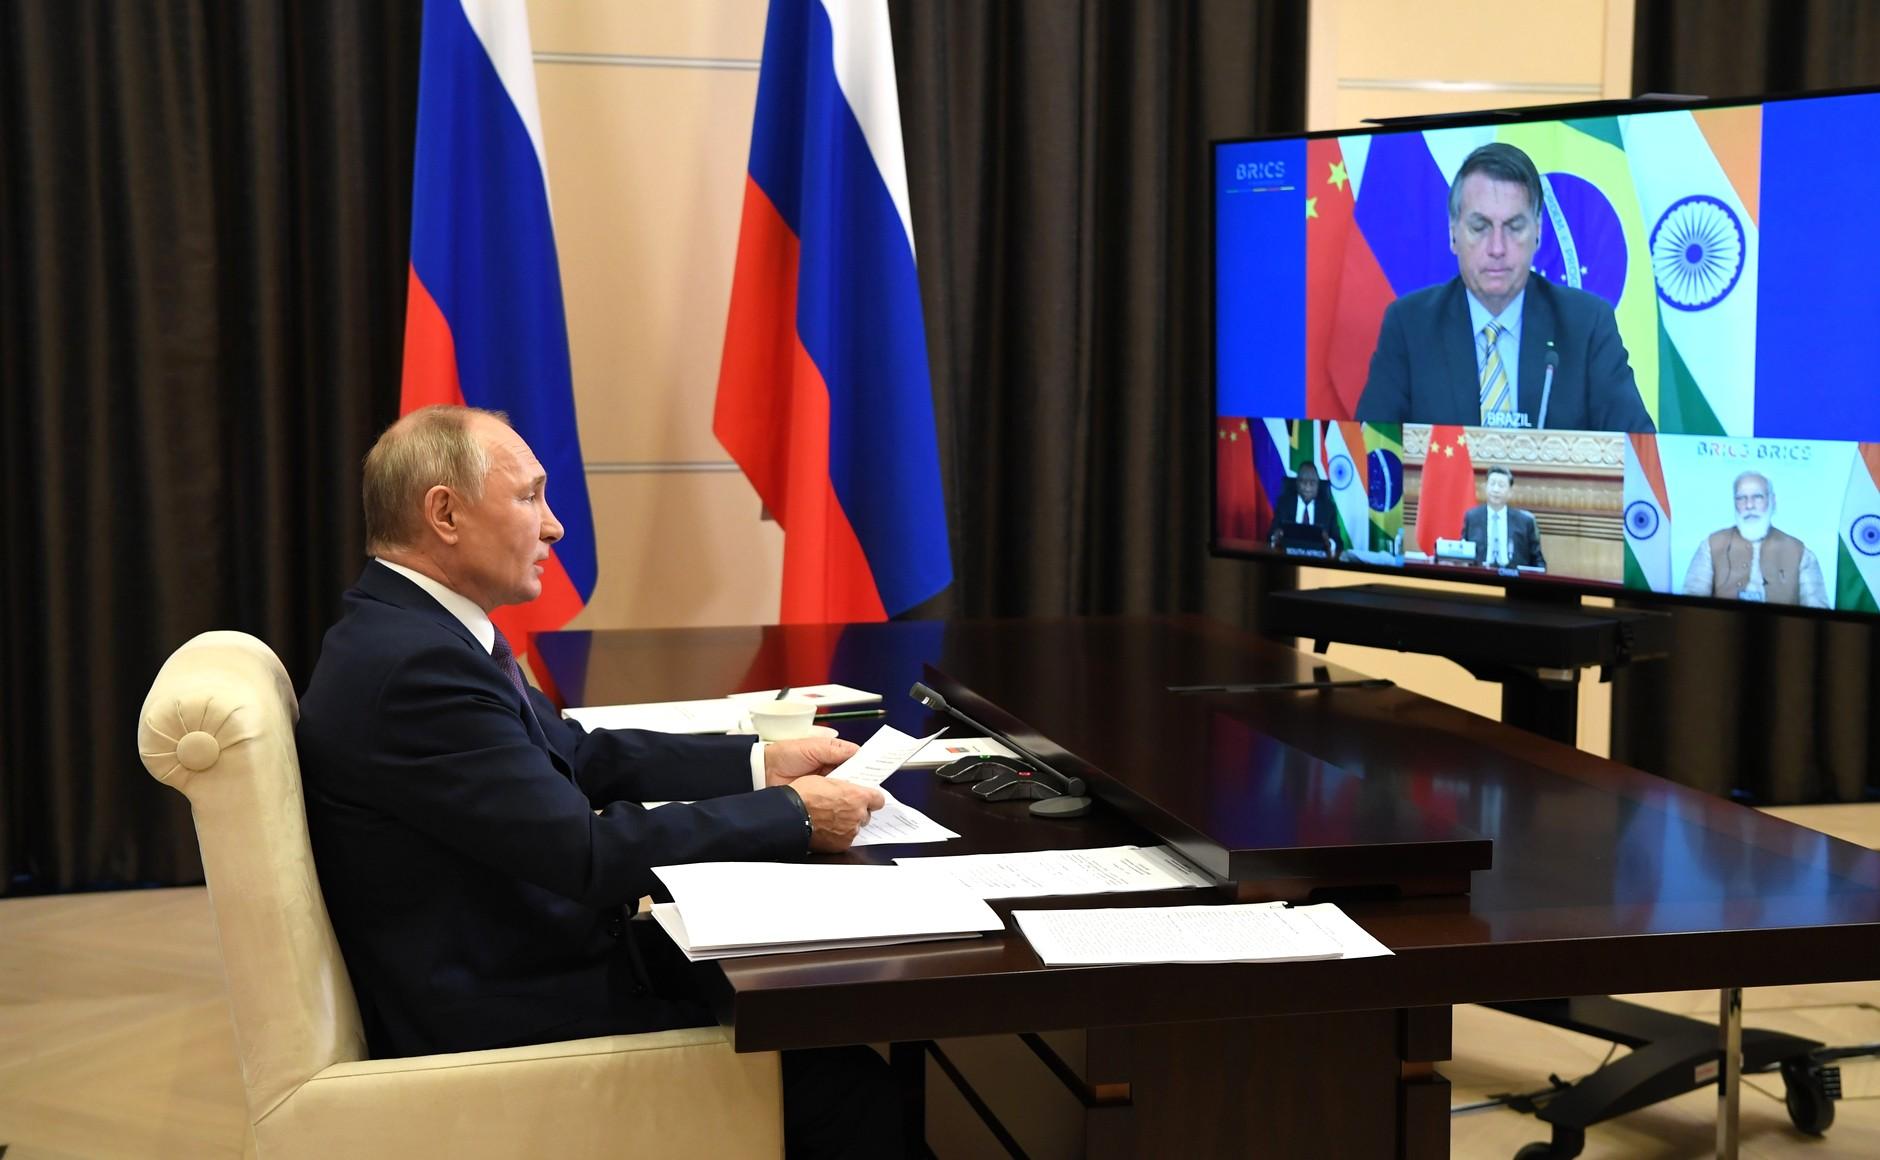 BRICS KREMLIN PH 2 XX 4 BRICS 17.11.2020 Sommet BRICS